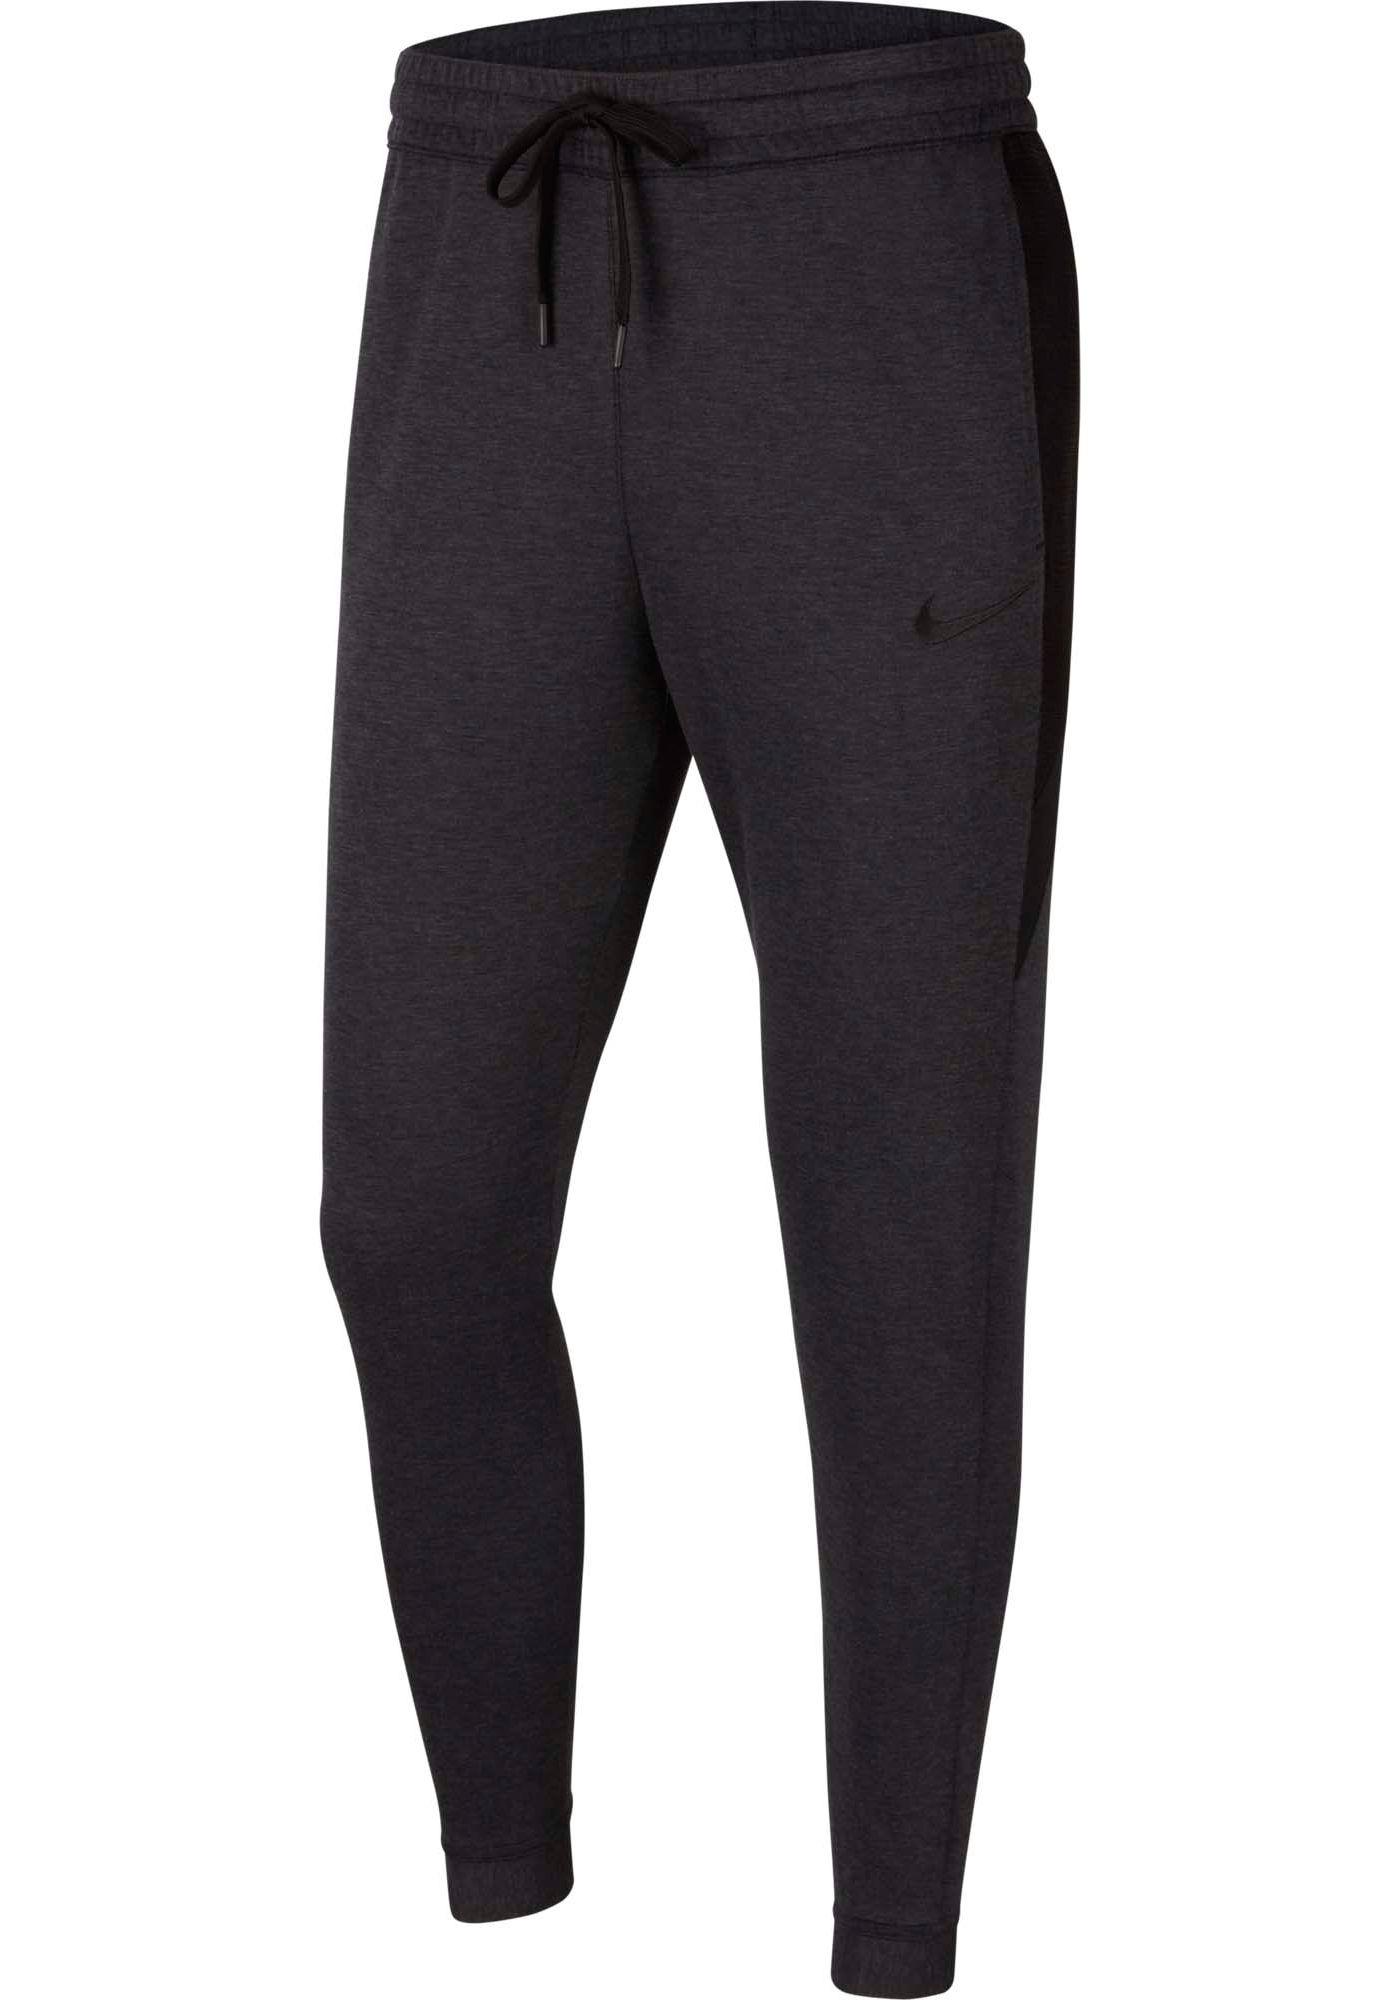 Nike Men's Dri-FIT Showtime Basketball Pants